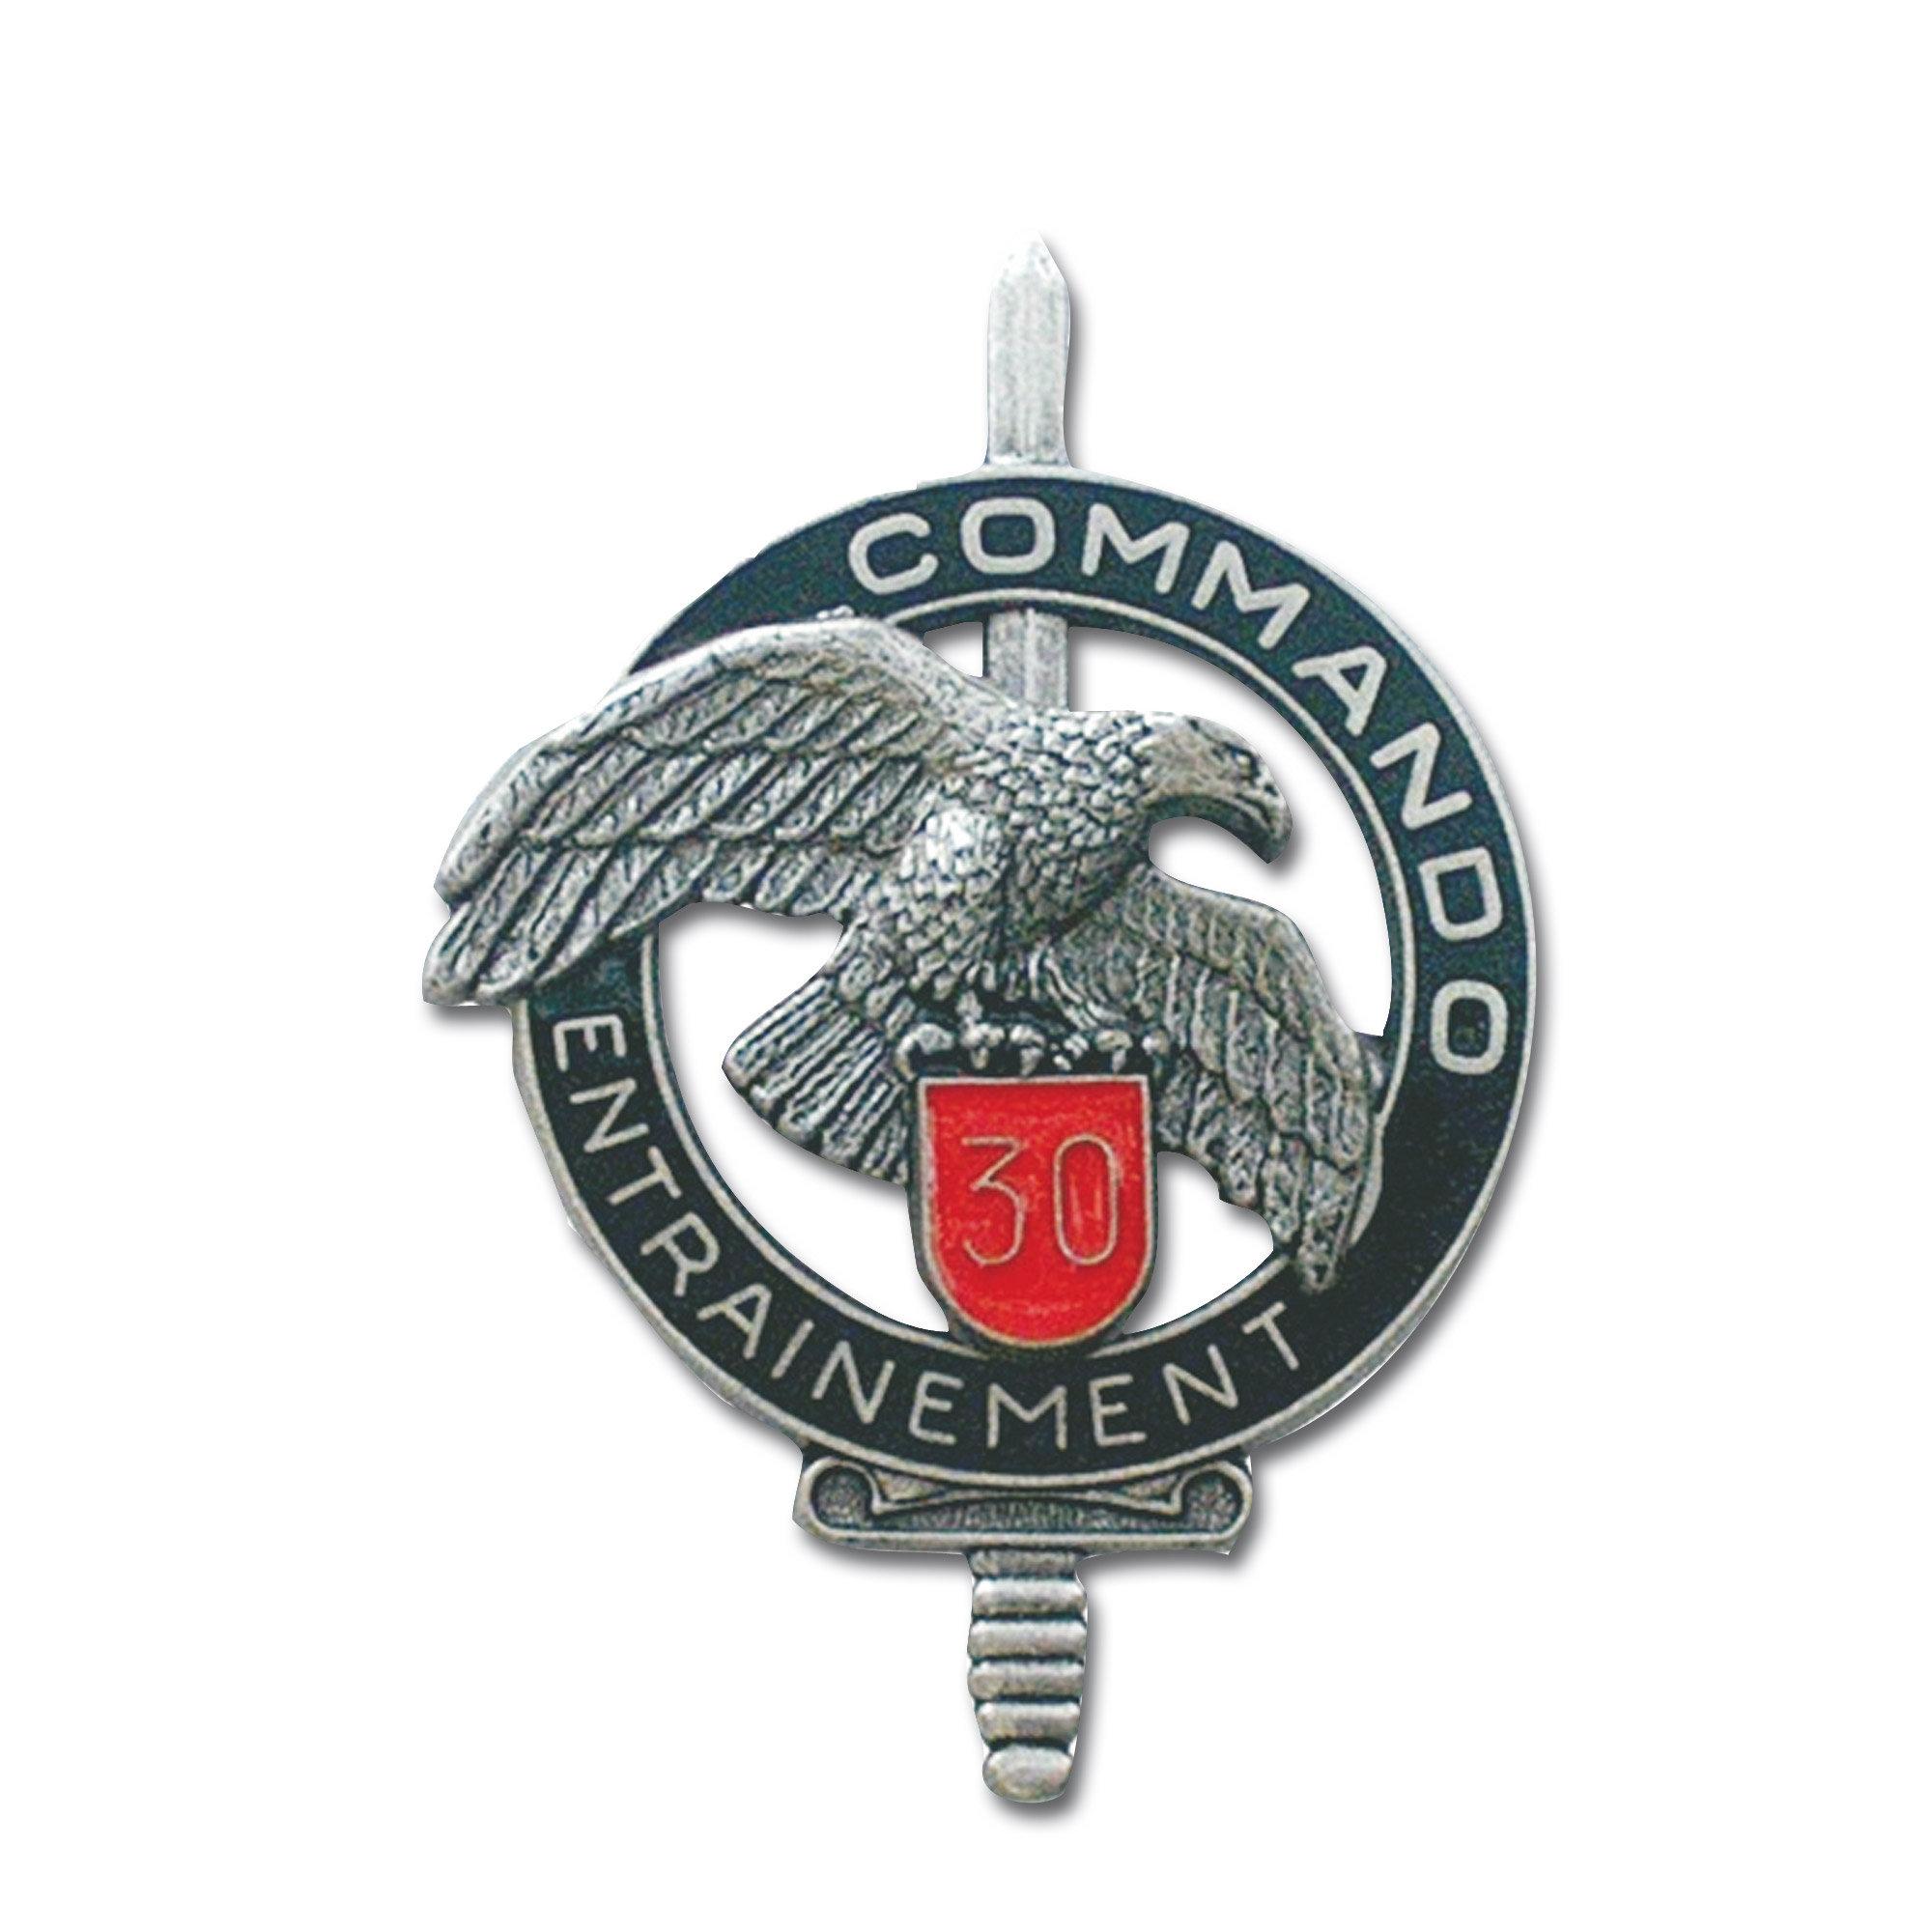 Abzeichen franz. Commando CEC 30